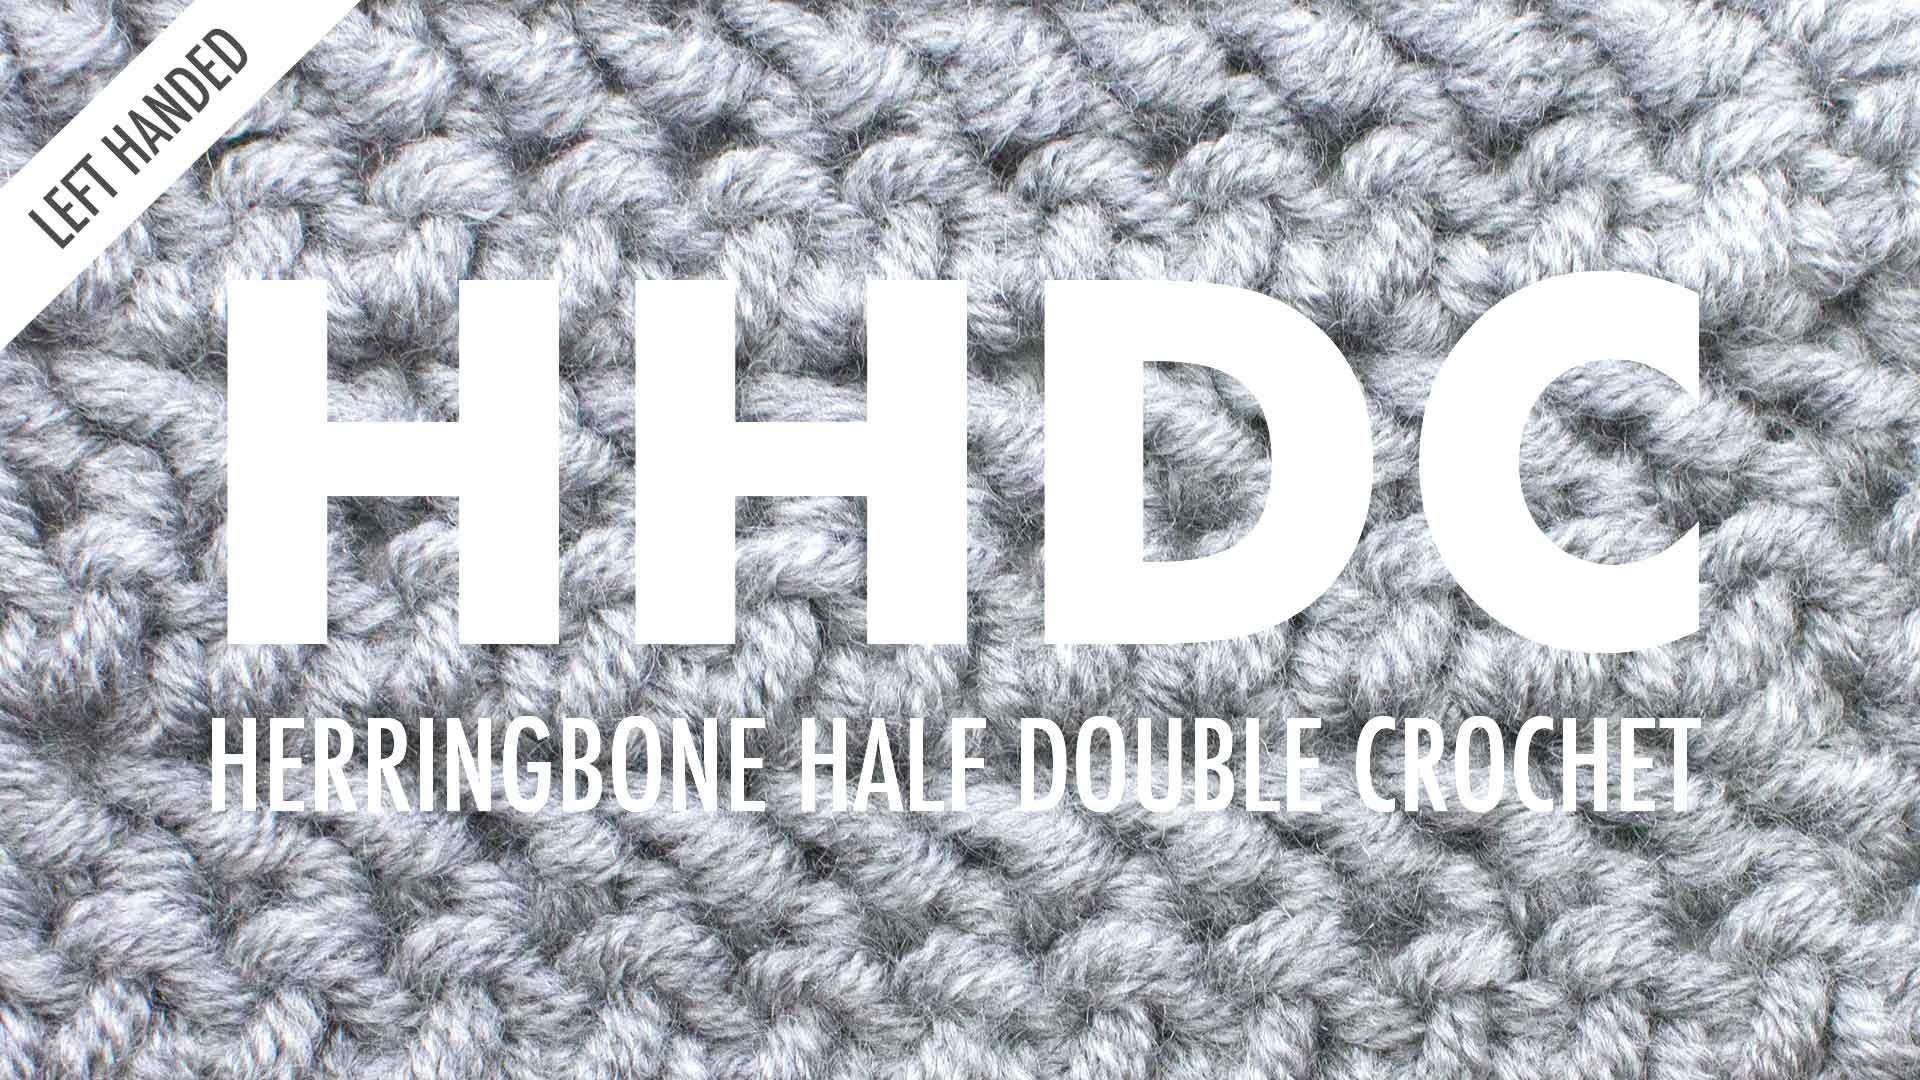 The Herringbone Half Double Crochet :: Crochet Abbreviation :: Left Handed